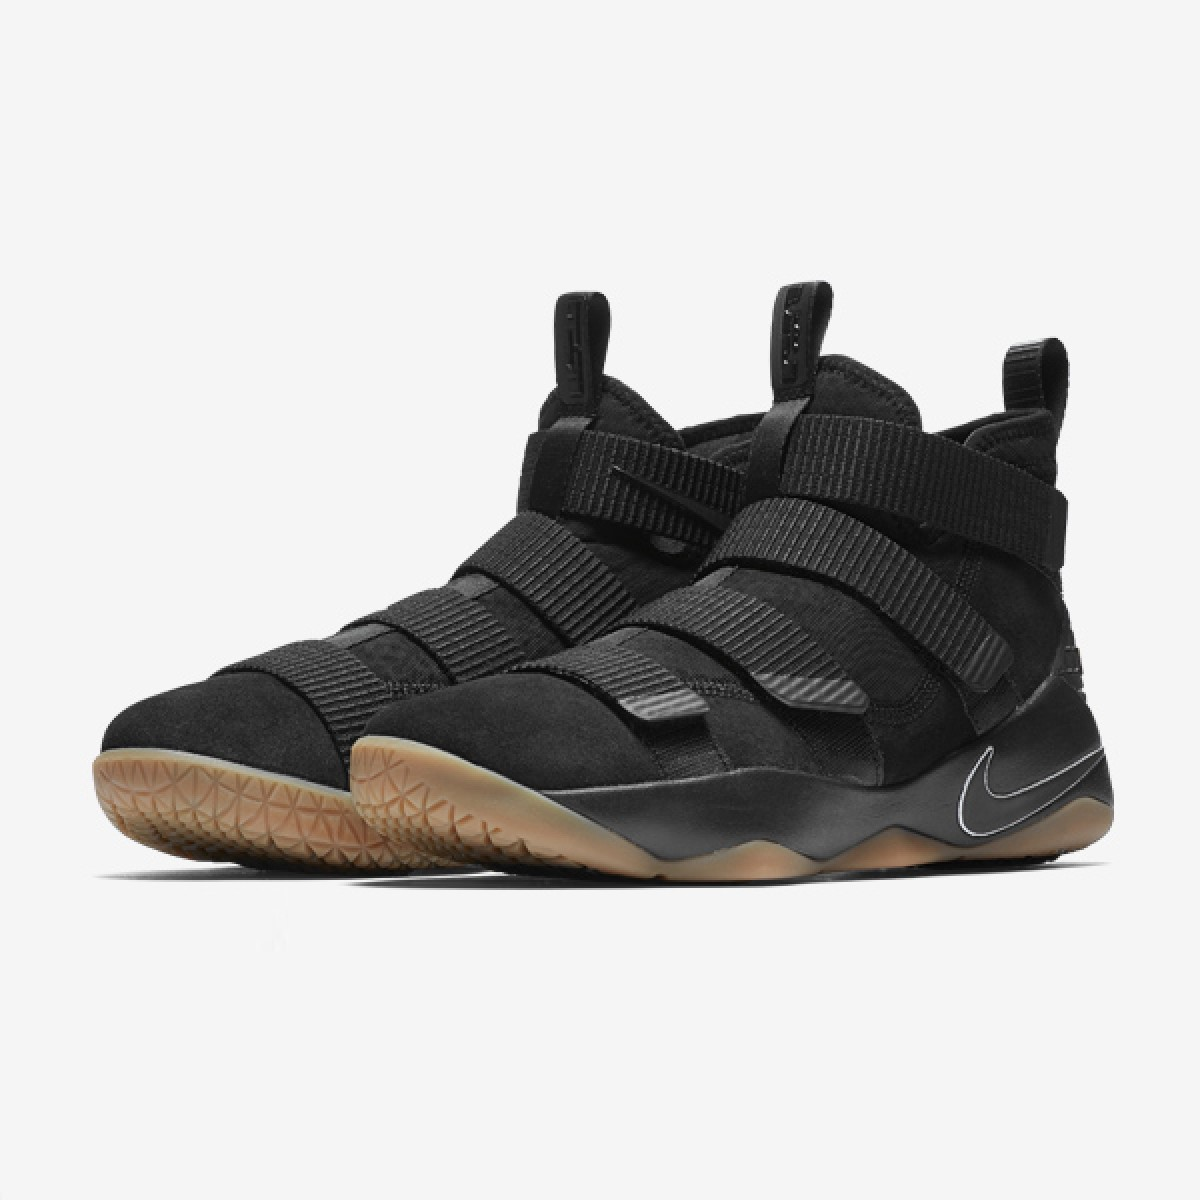 Nike Lebron Soldier XI 'Black Gum' 897644-007